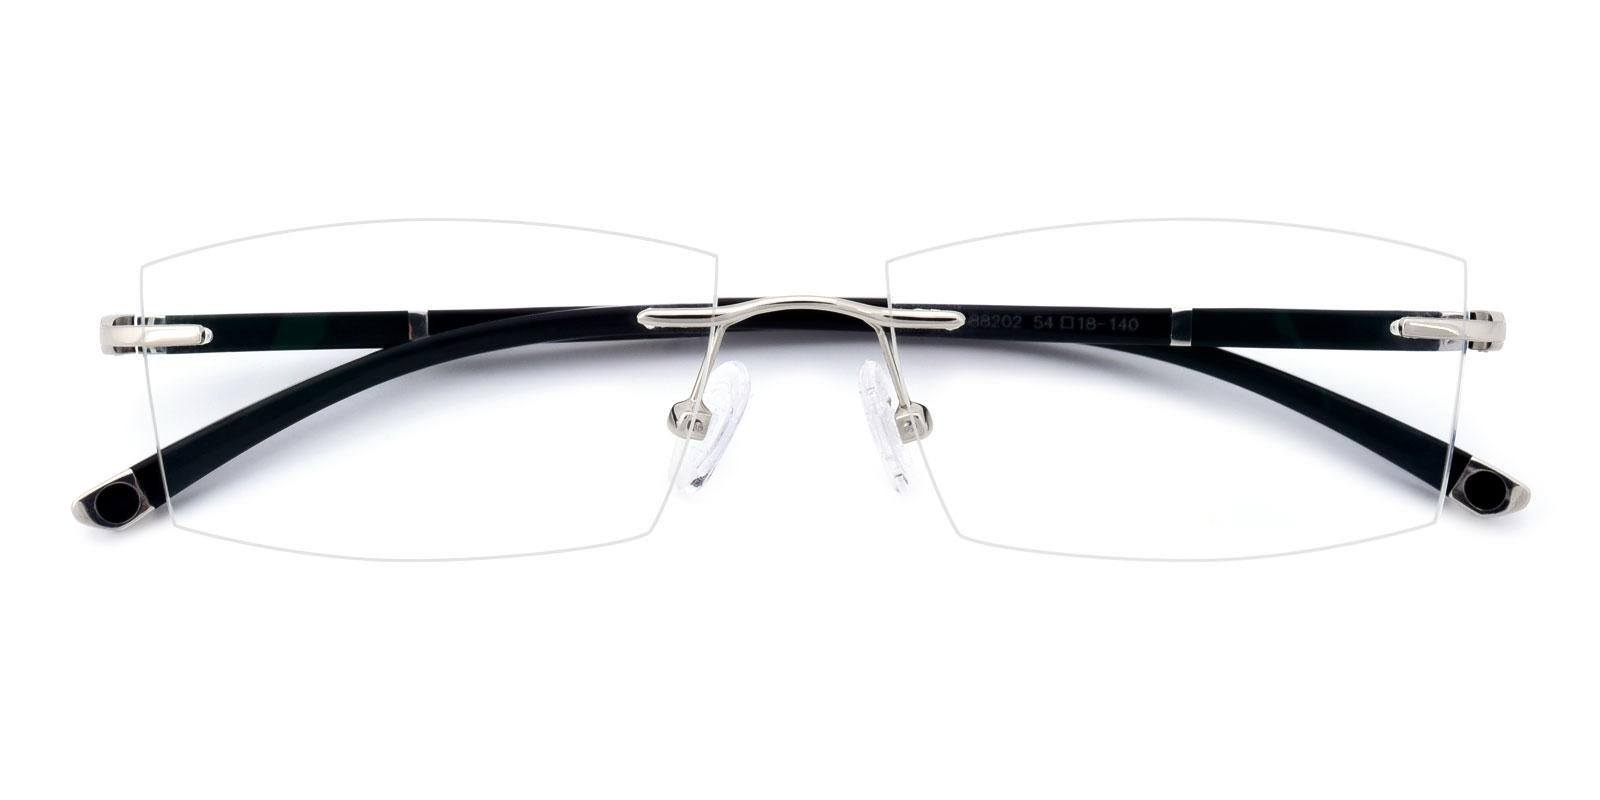 Doumbia-Silver-Varieties-Titanium-Eyeglasses-detail